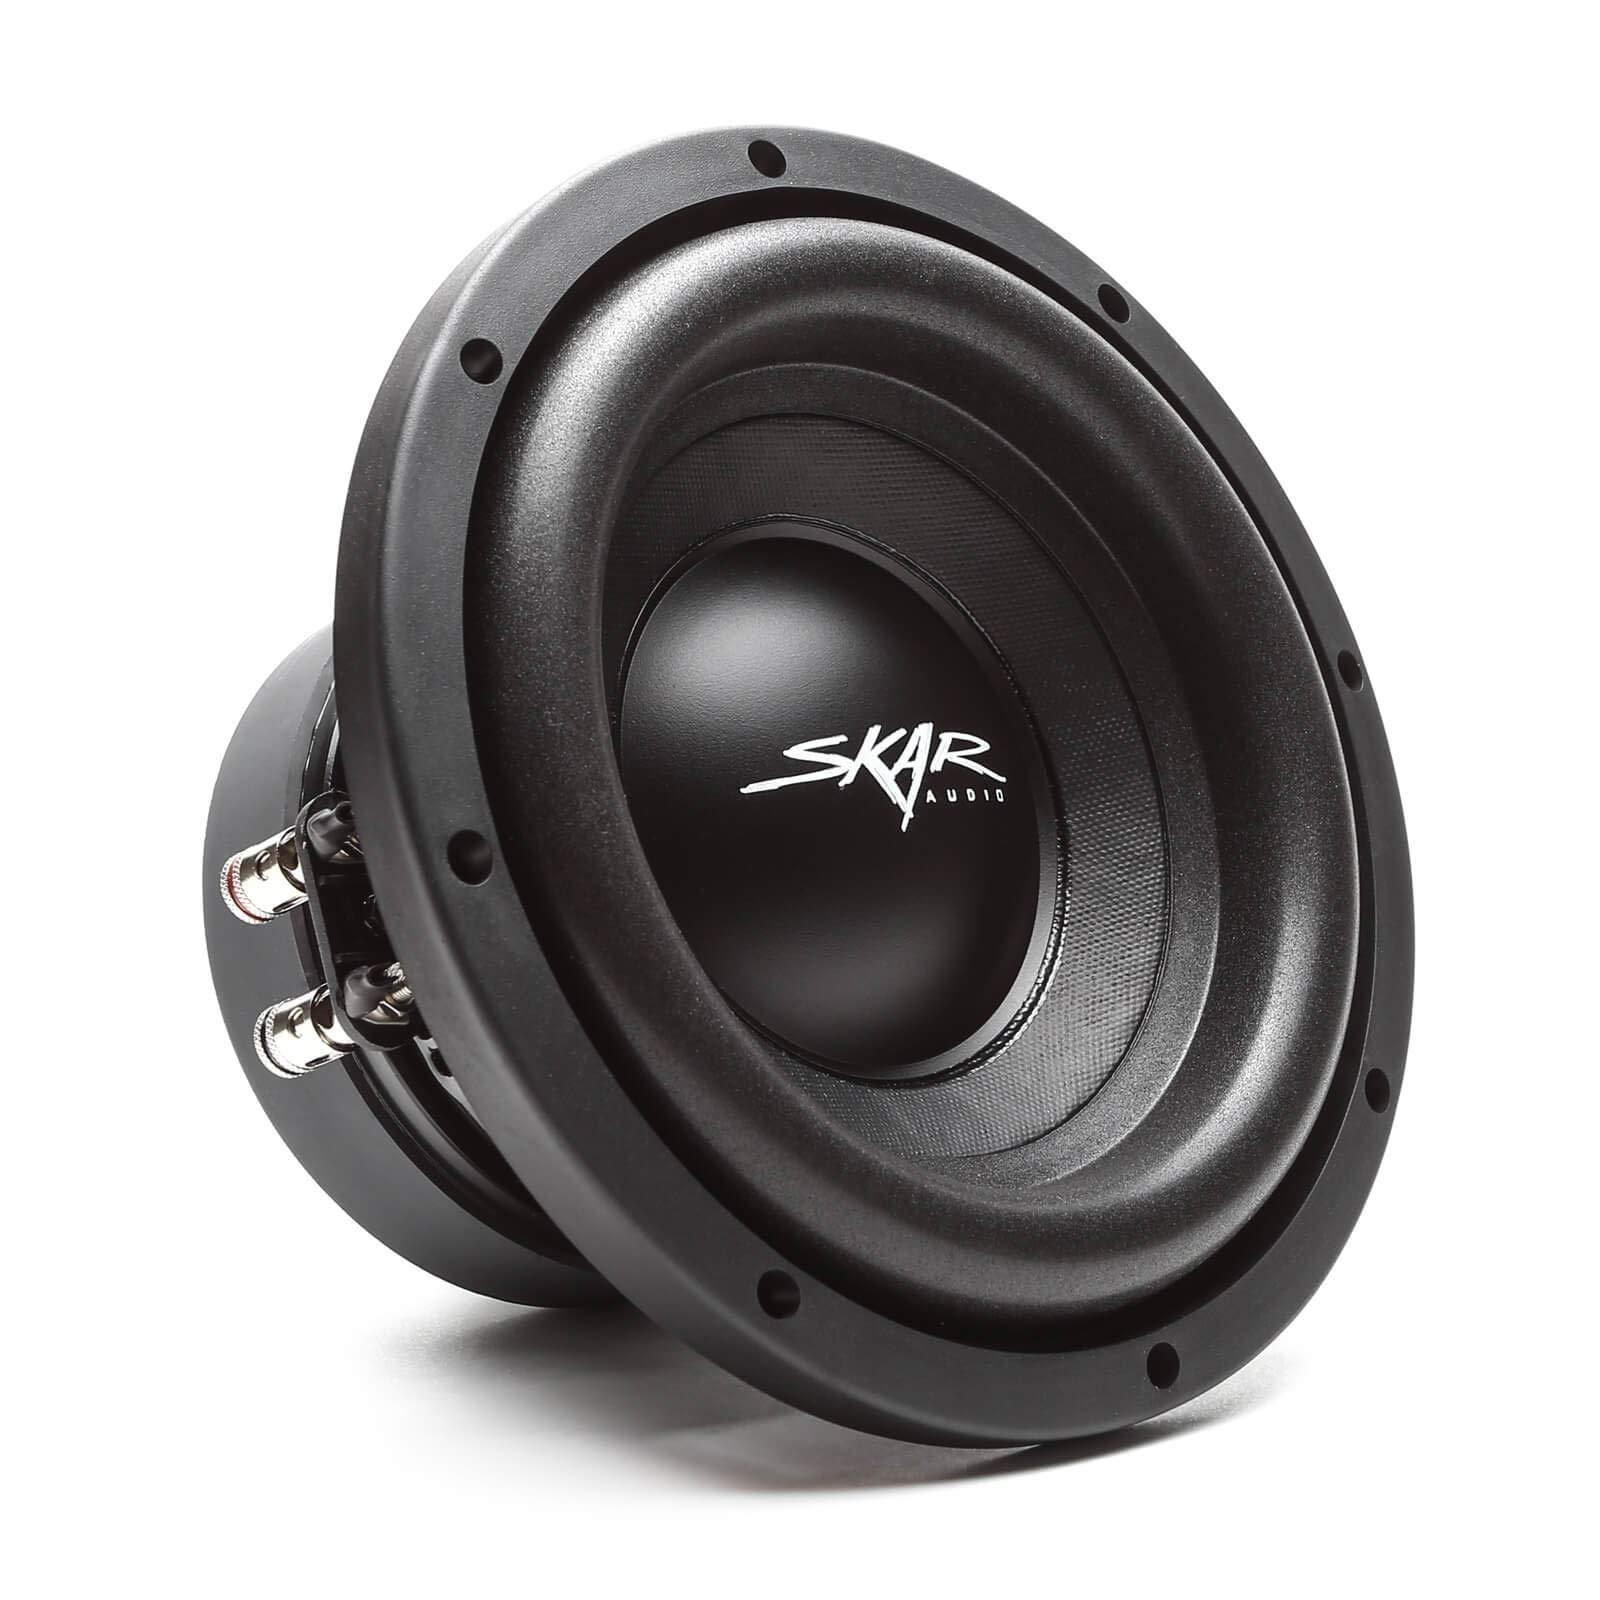 Skar Audio SDR-8 D4 8'' 700 Watt Max Power Dual 4 Ohm Car Subwoofer by Skar Audio